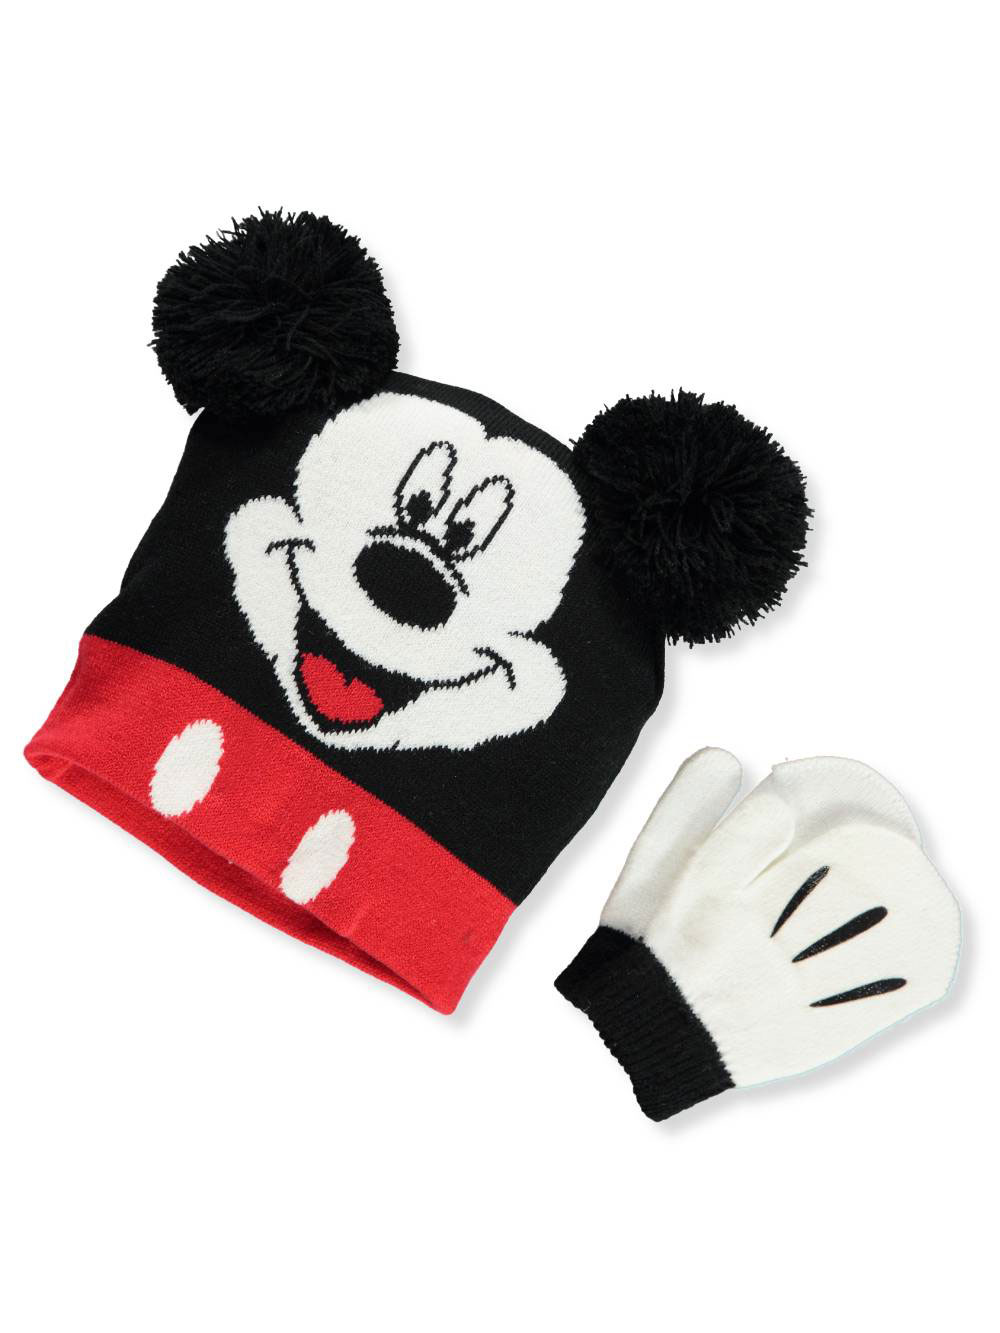 Disney Mickey Mouse Boys' Beanie & Mittens Set (Toddler One Size)